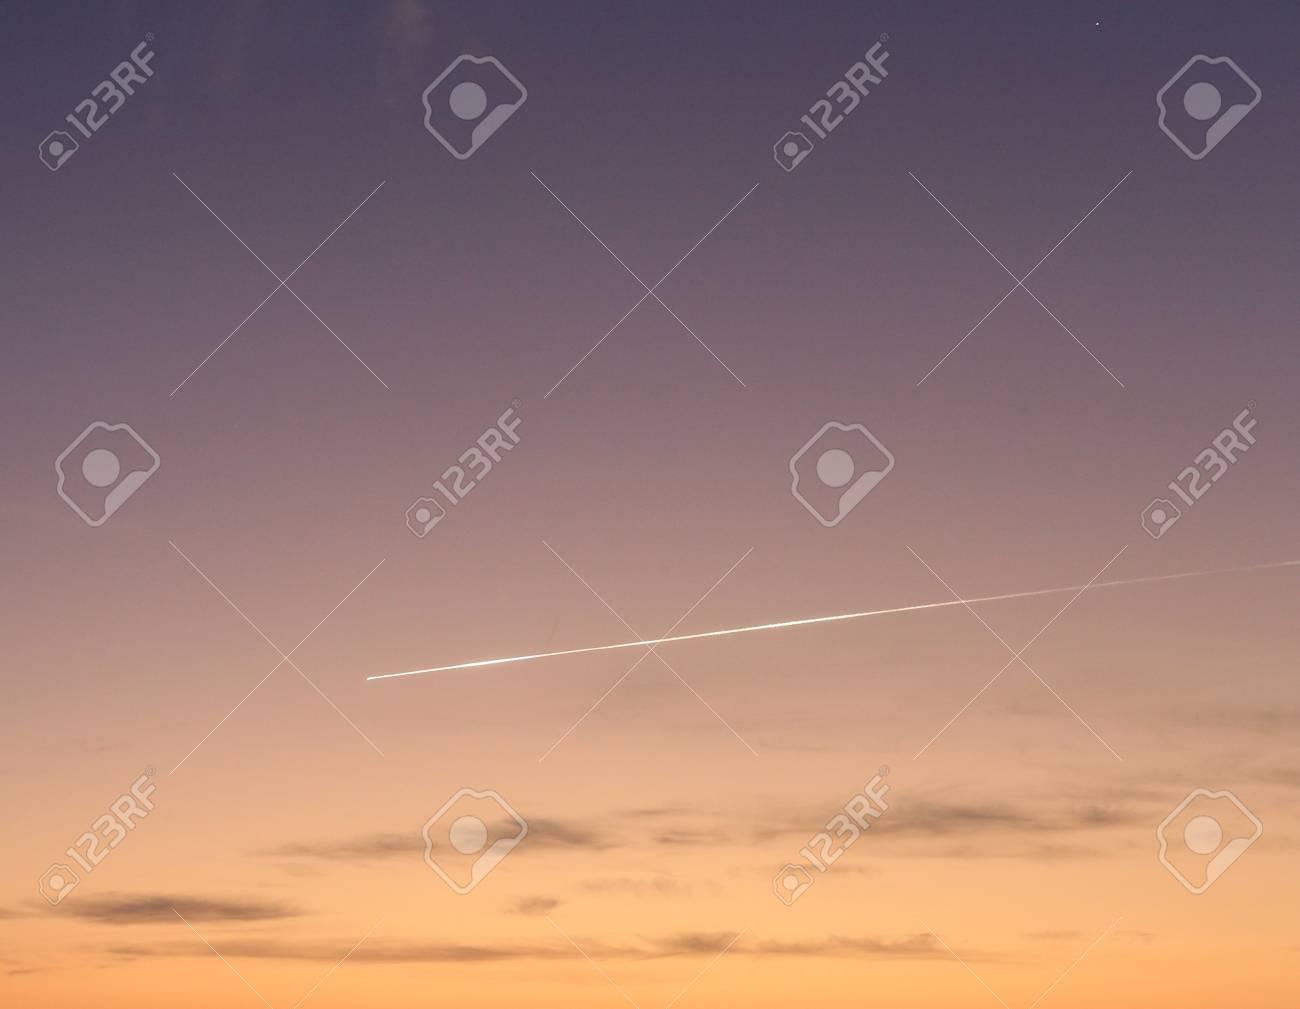 flying meteor on morning sky background